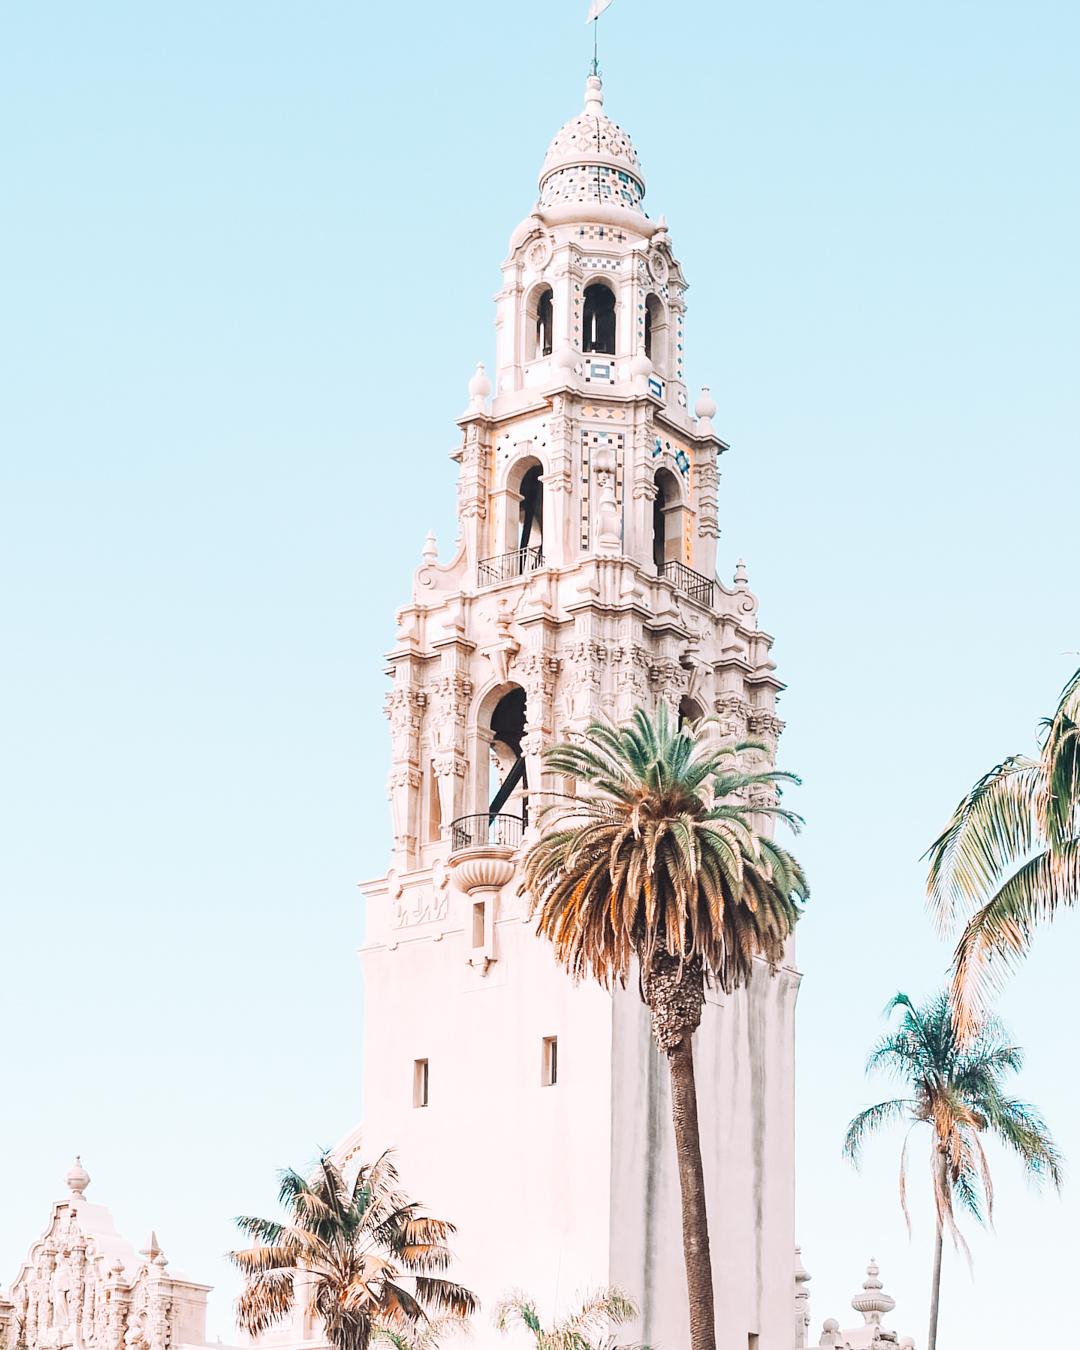 Building in Balboa Park in San Diego